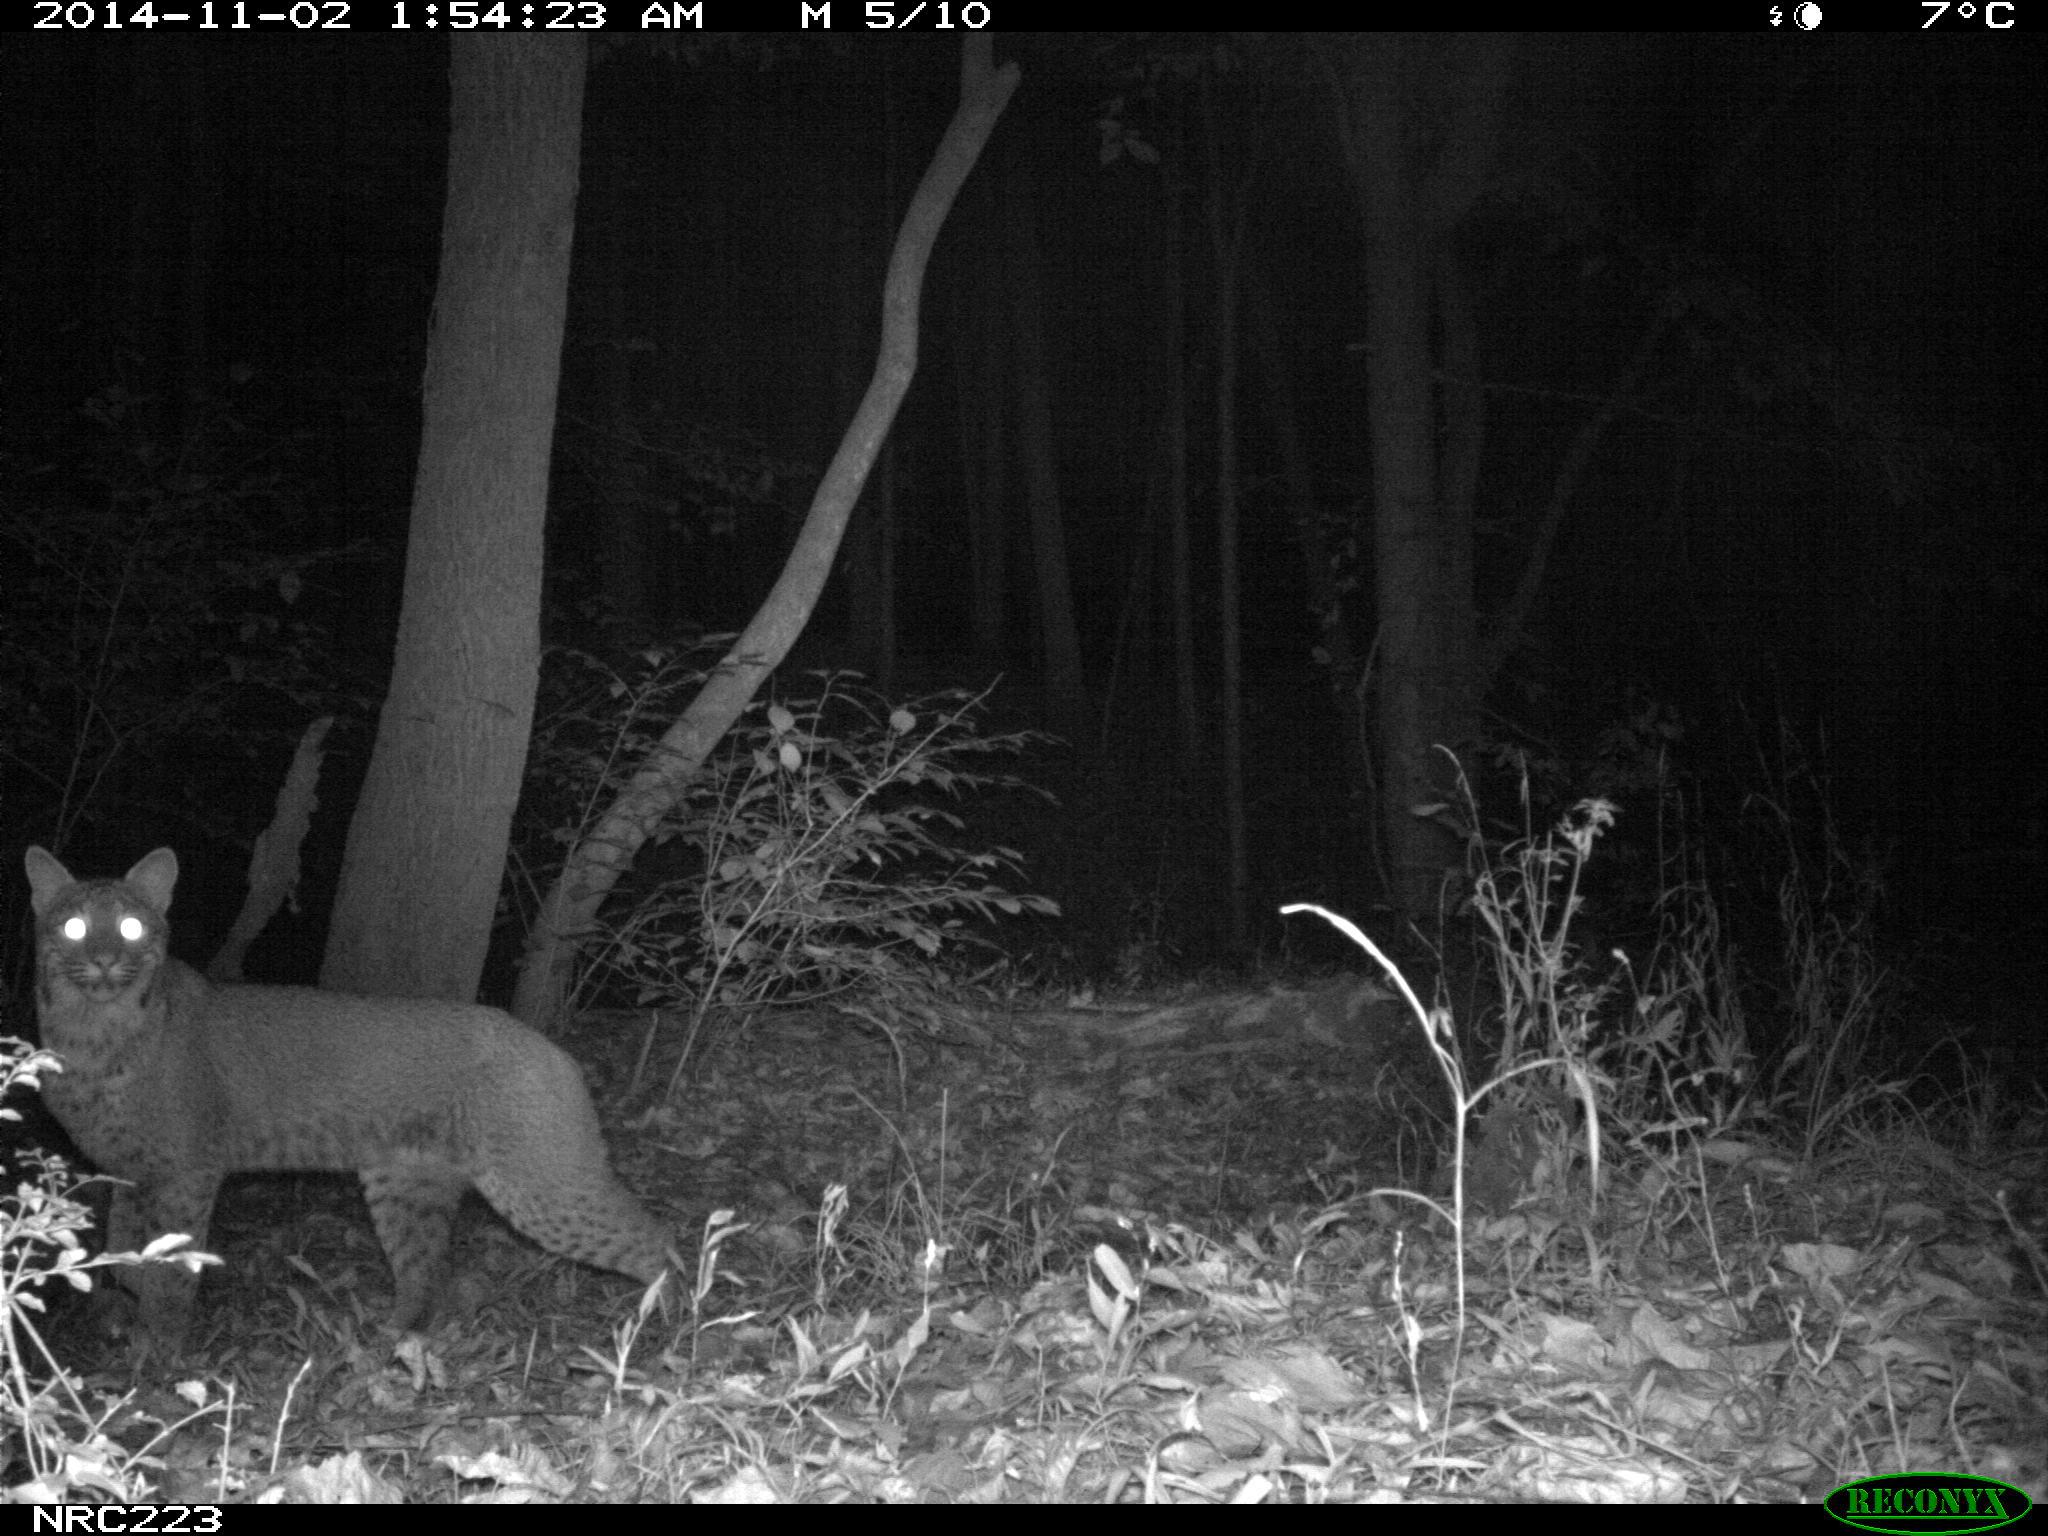 bobcat on camera trap